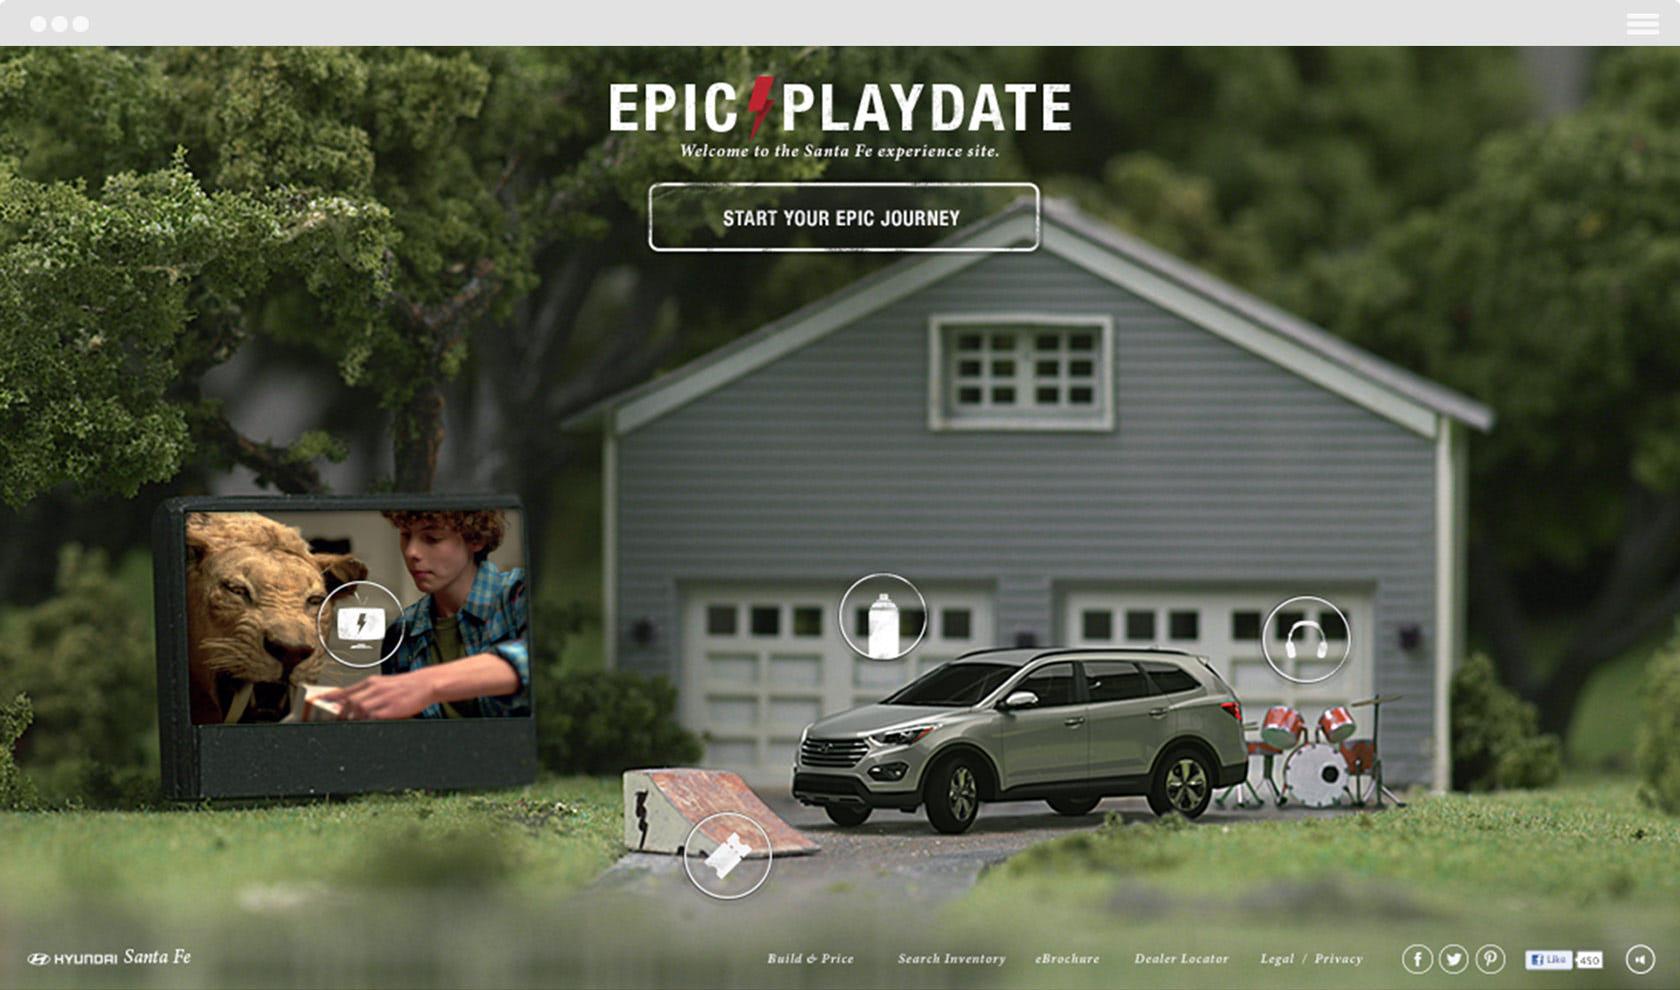 Hyundai Santa Fe — Epic Playdate Frontpage